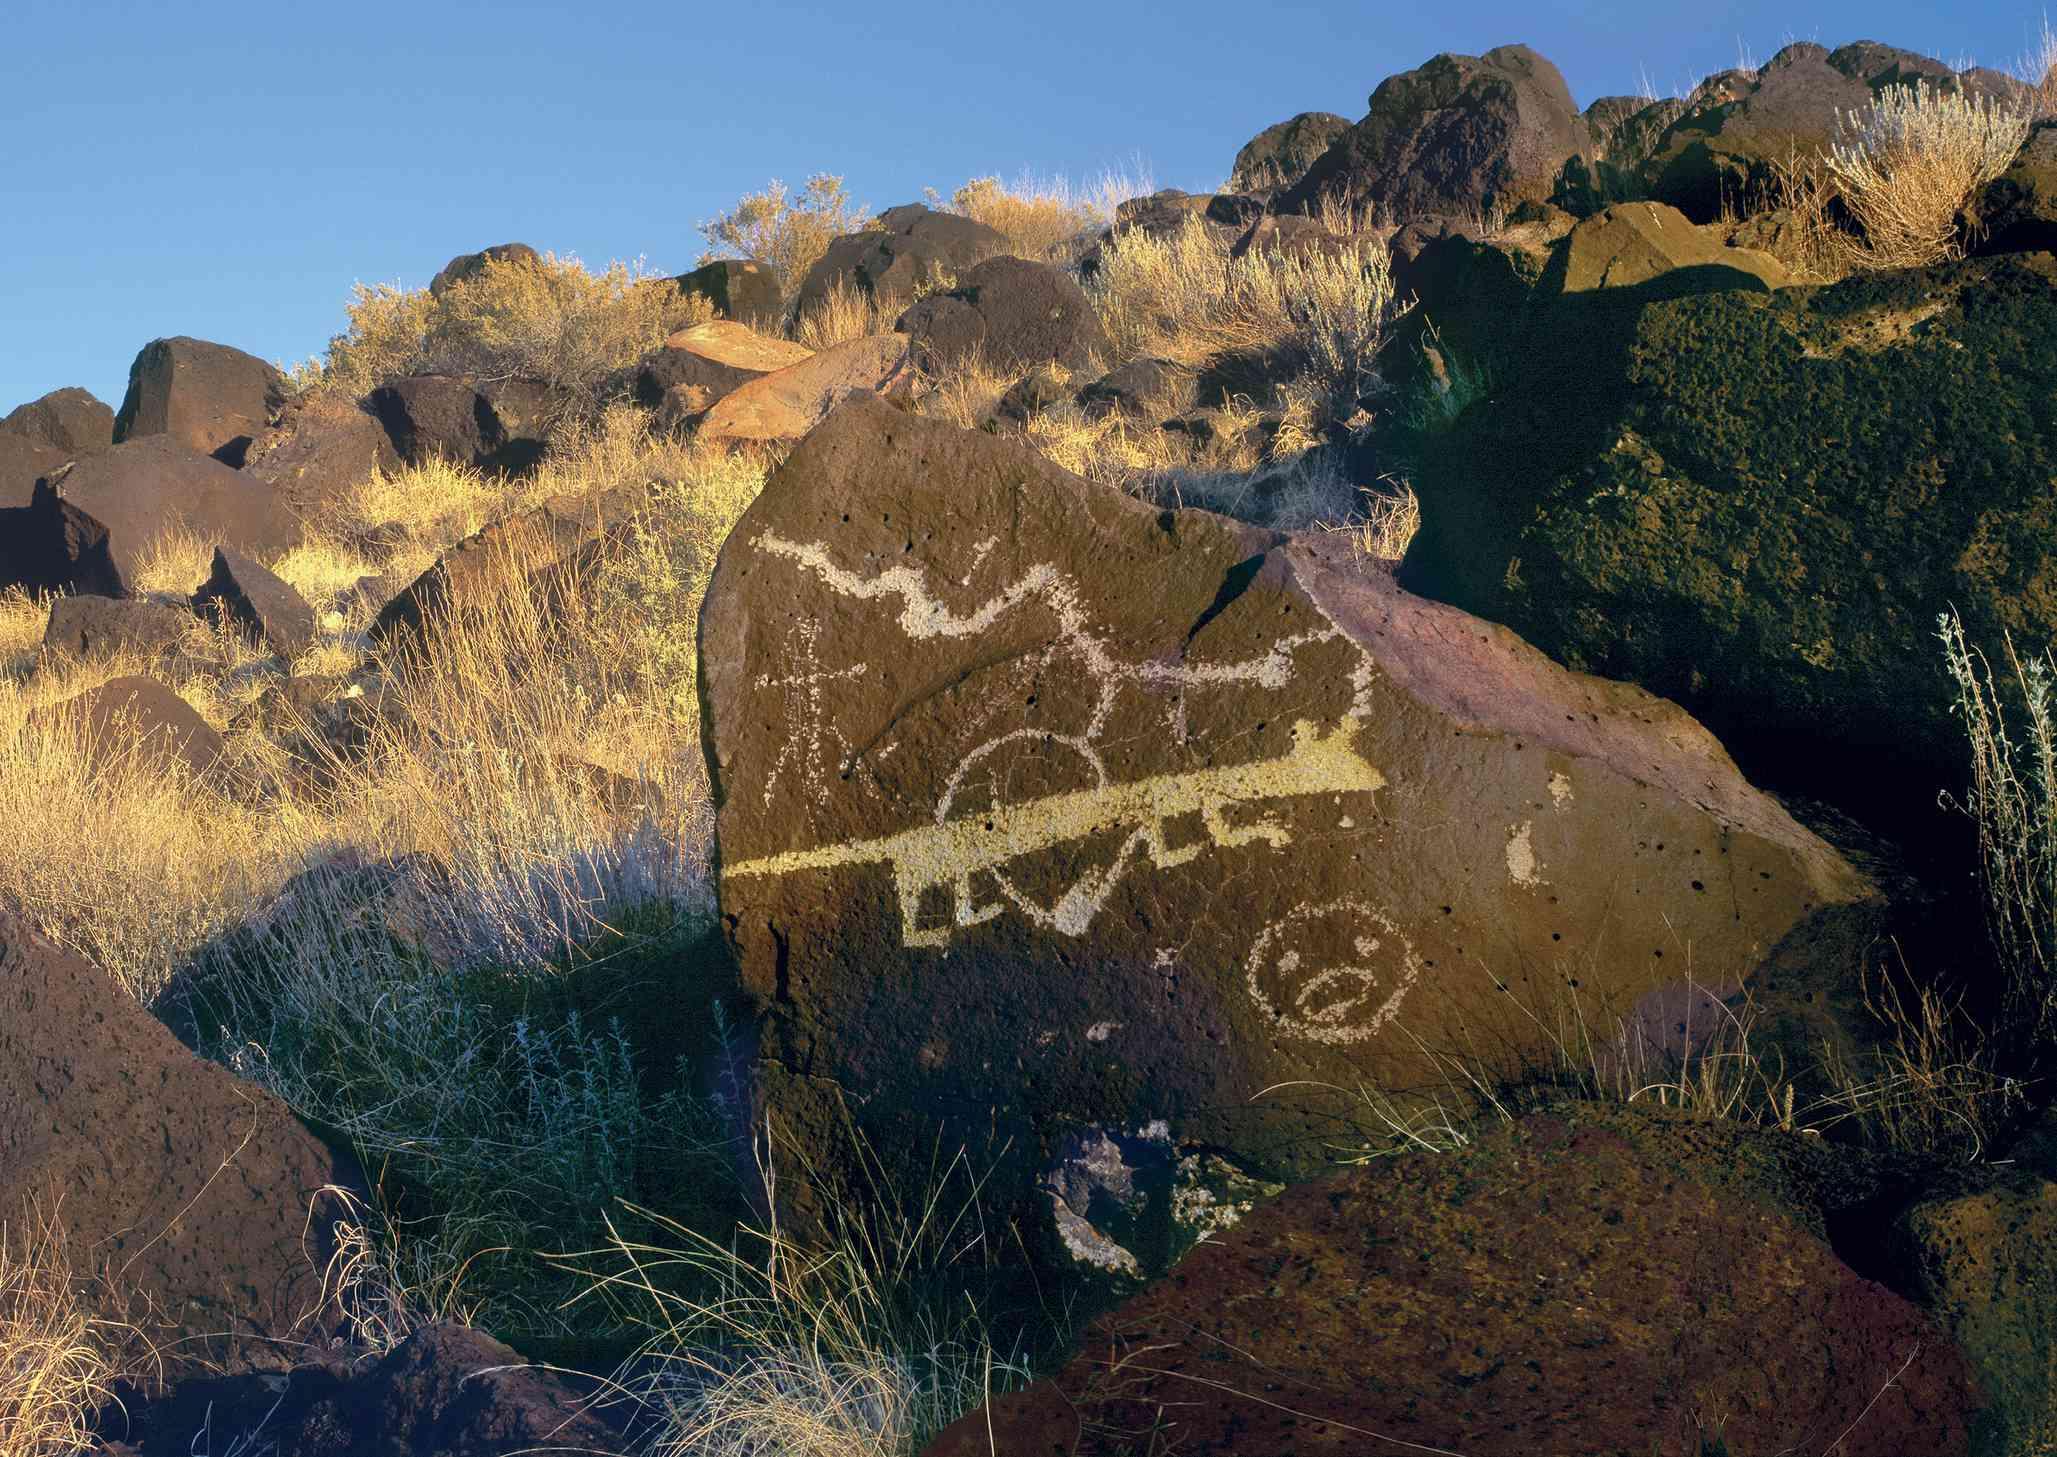 Petroglyph at Petroglyph National Monument